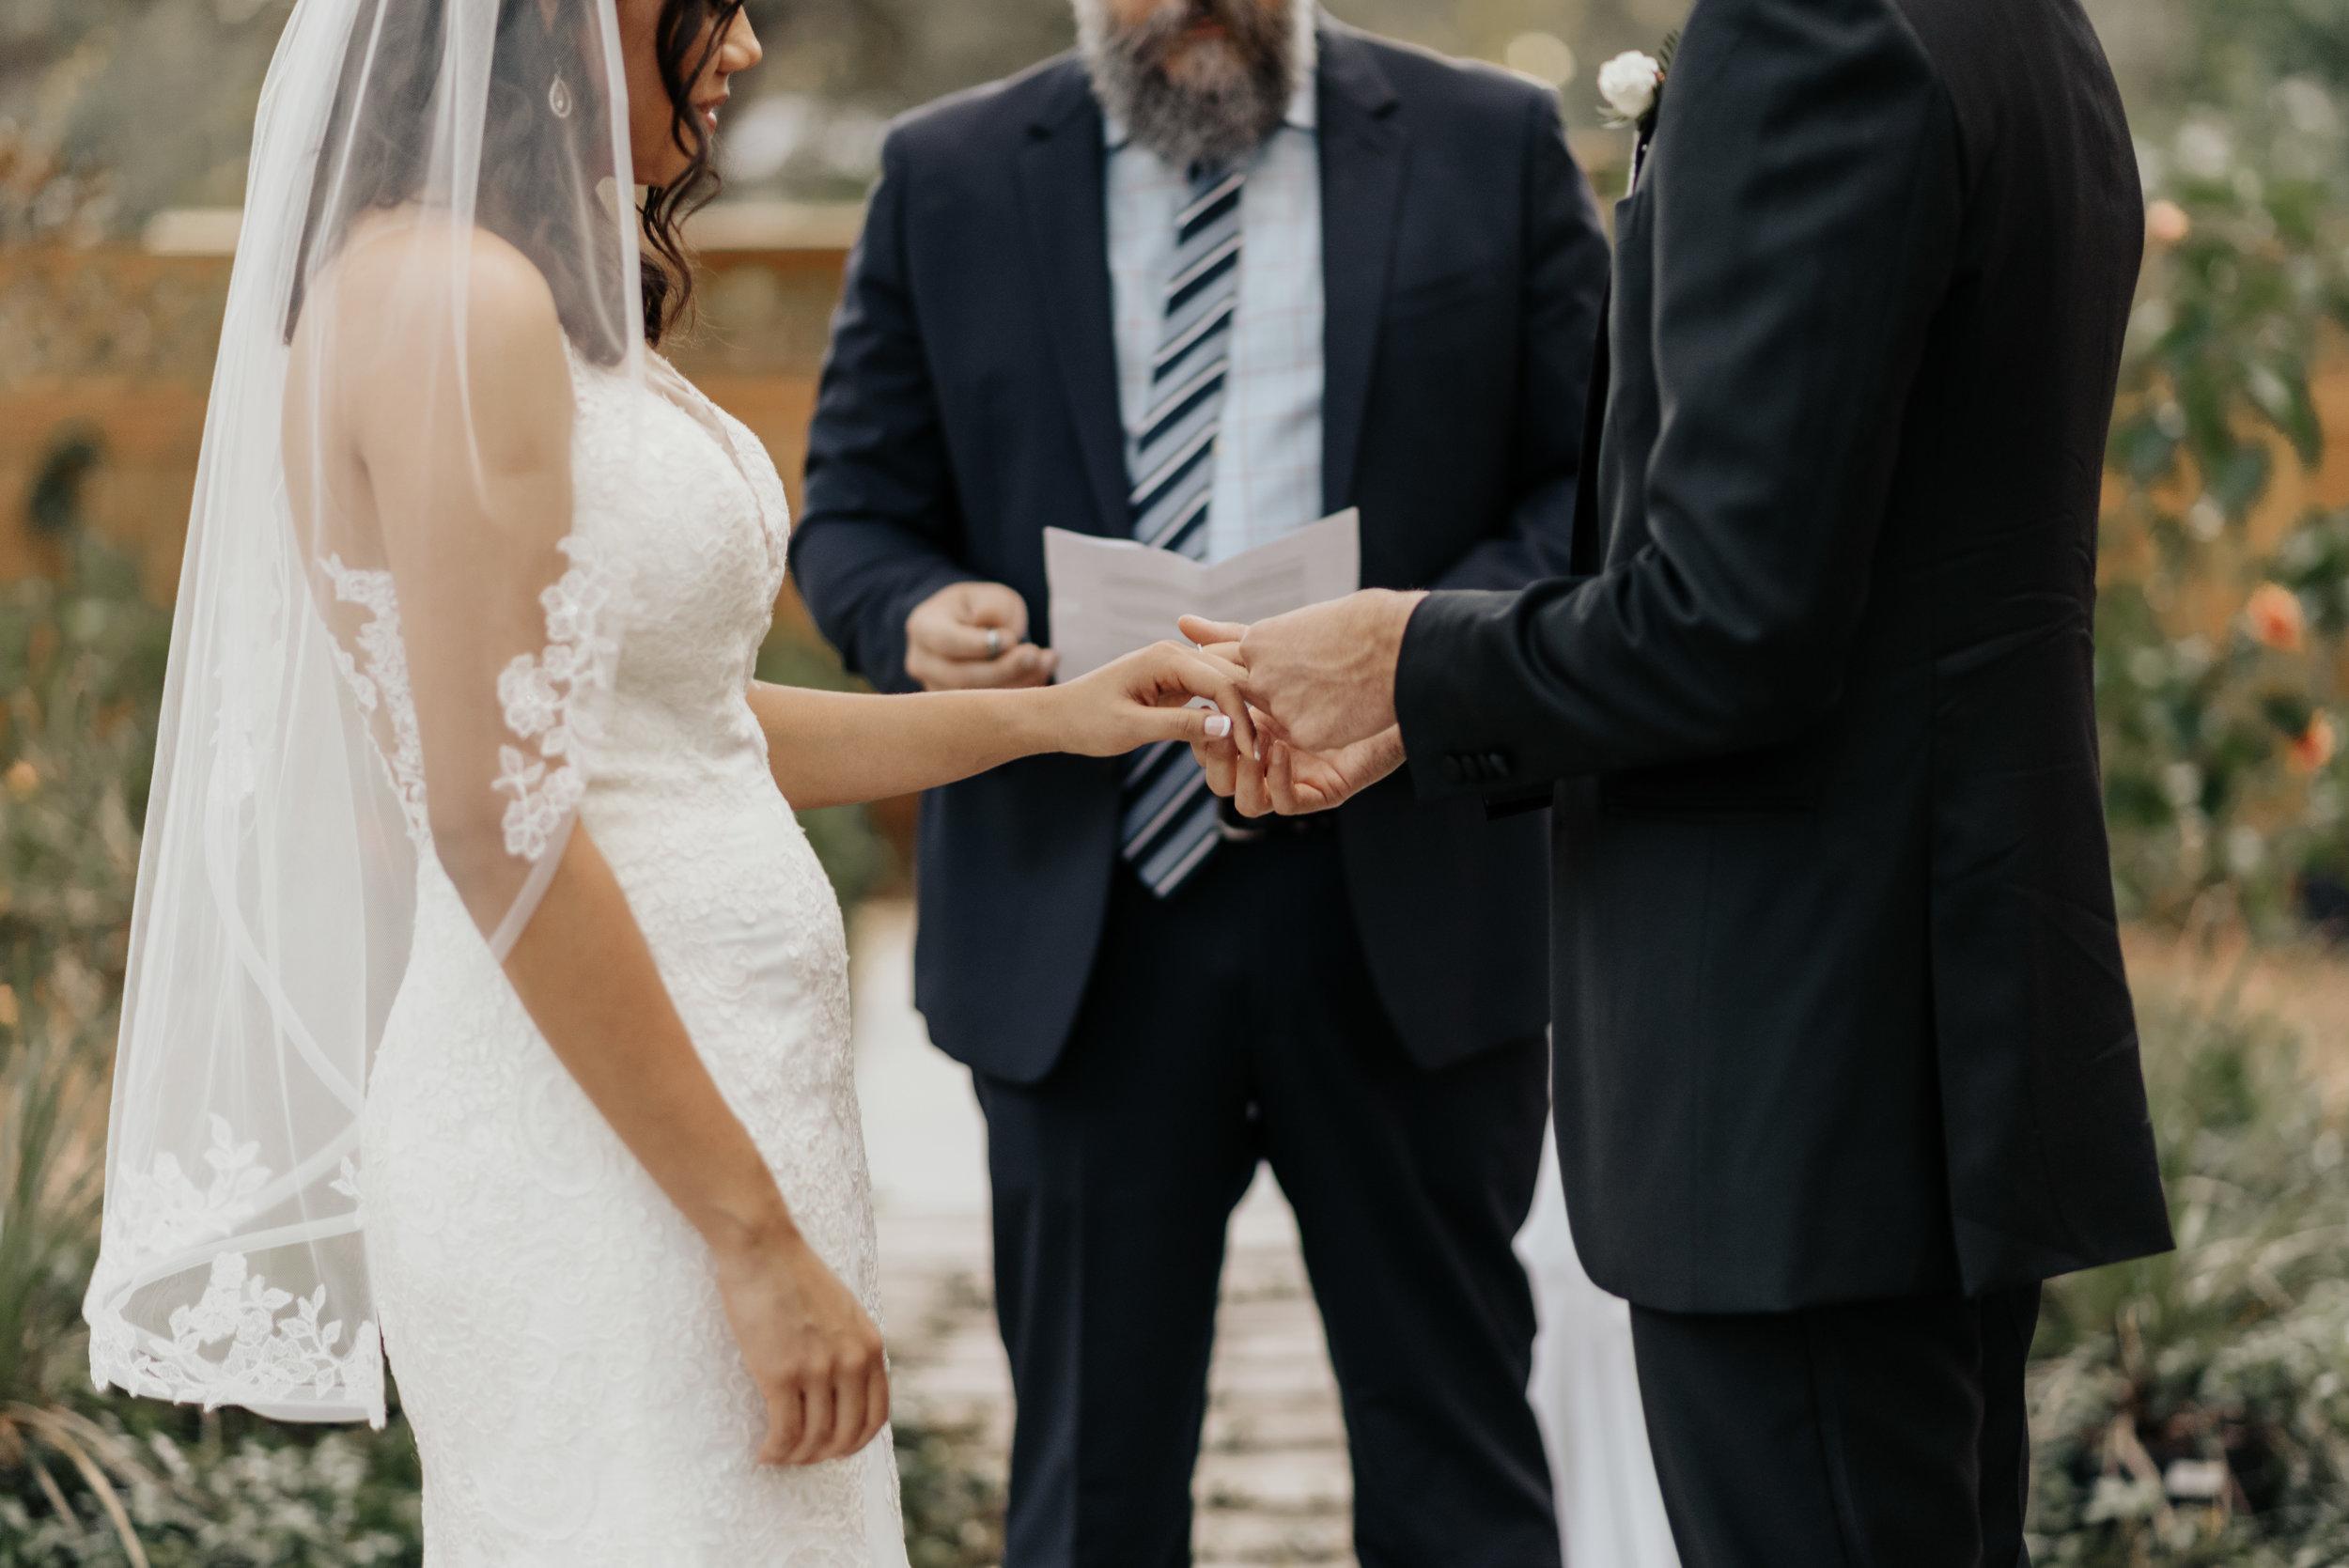 Kirstie-AJ-Wedding-0063.jpg